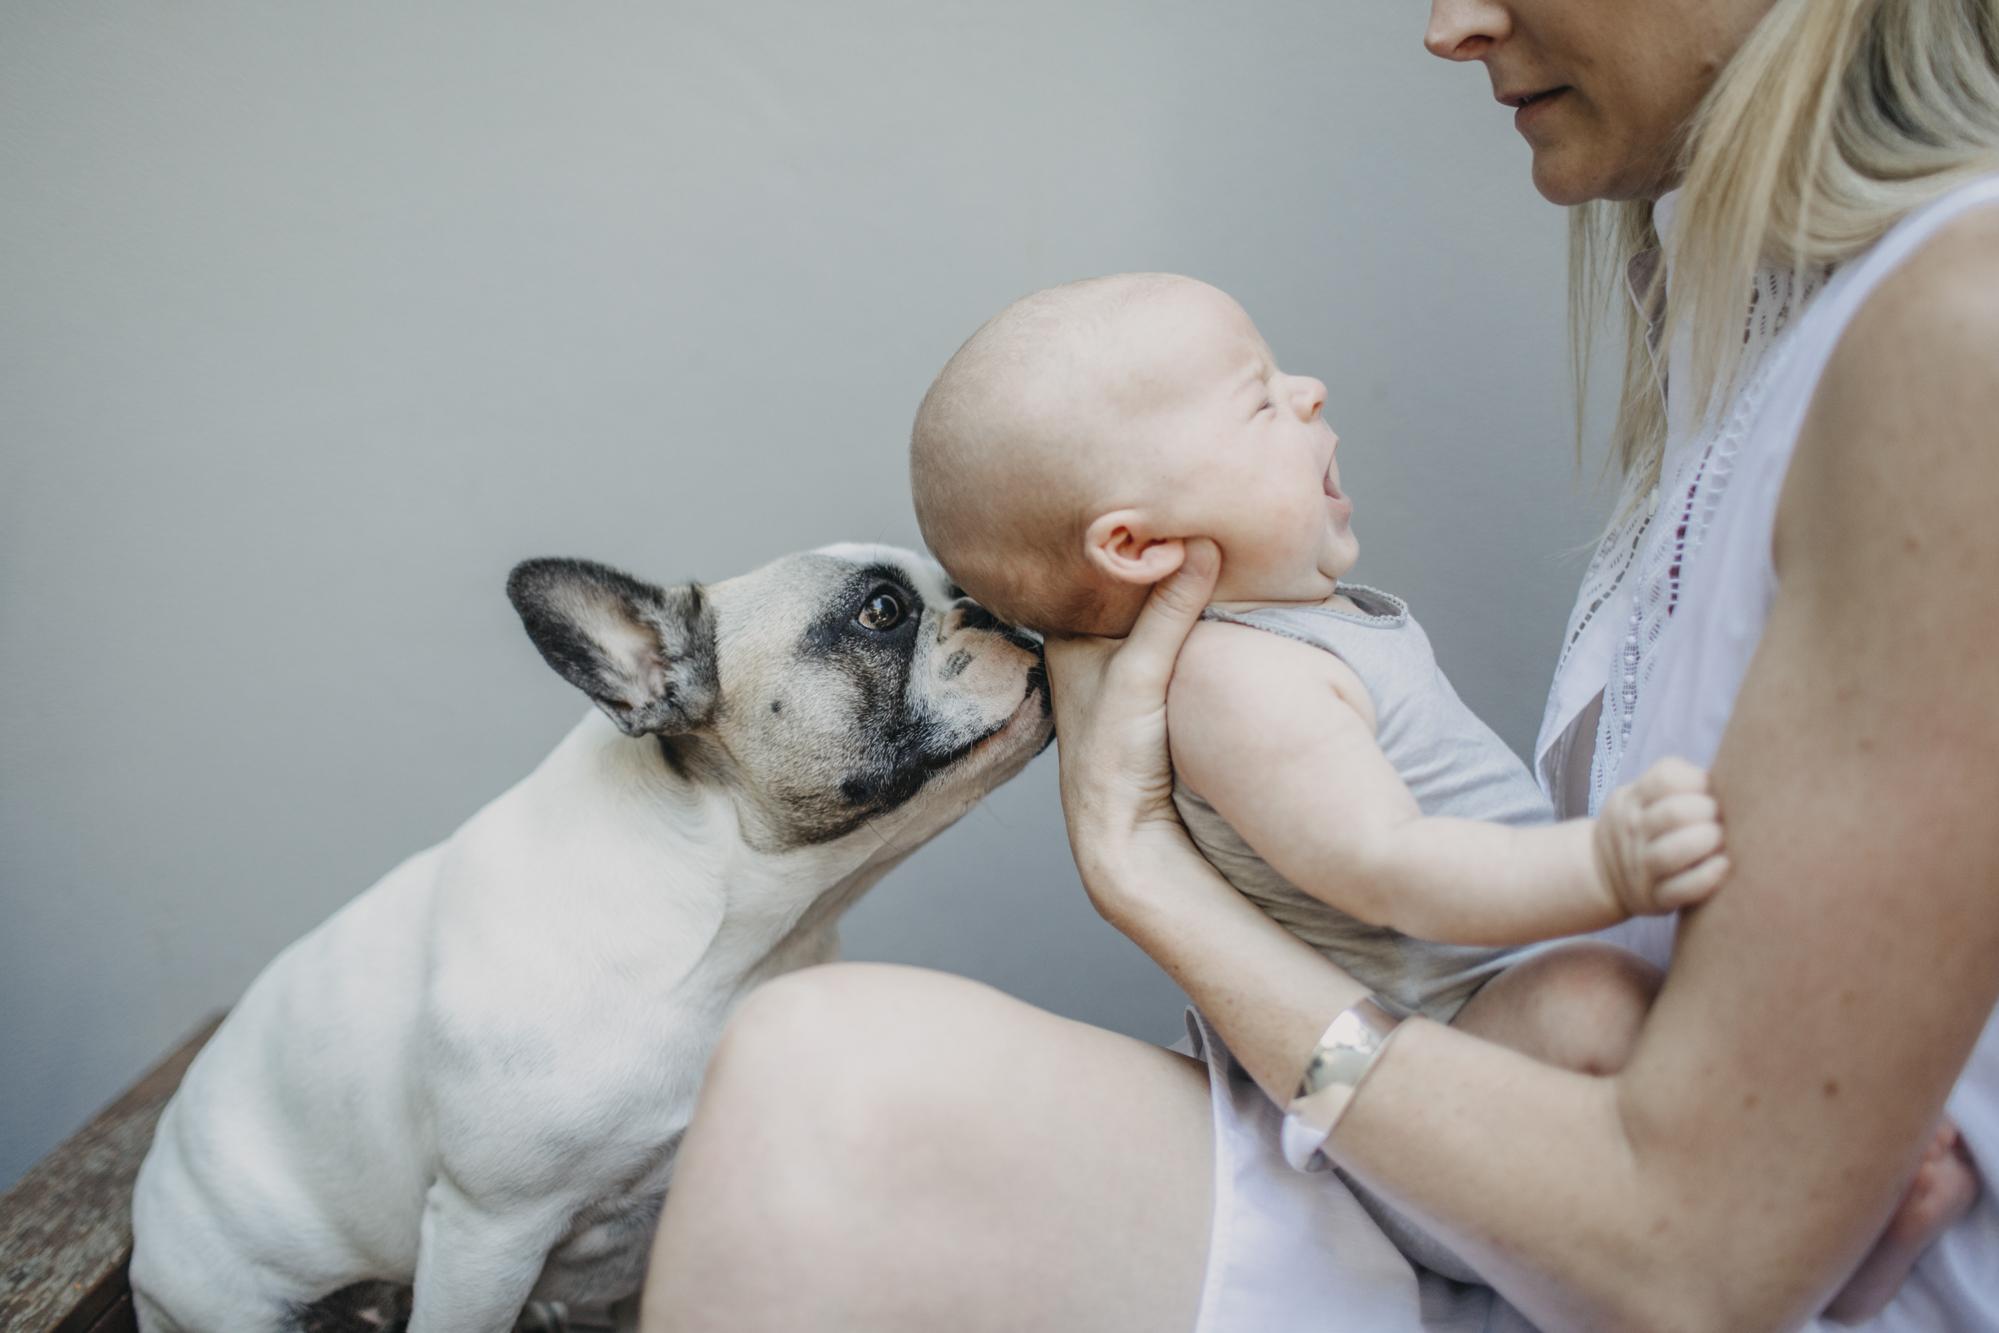 sheridan_nilsson_sydney_newborn_lifestyle_photographer.37.jpg